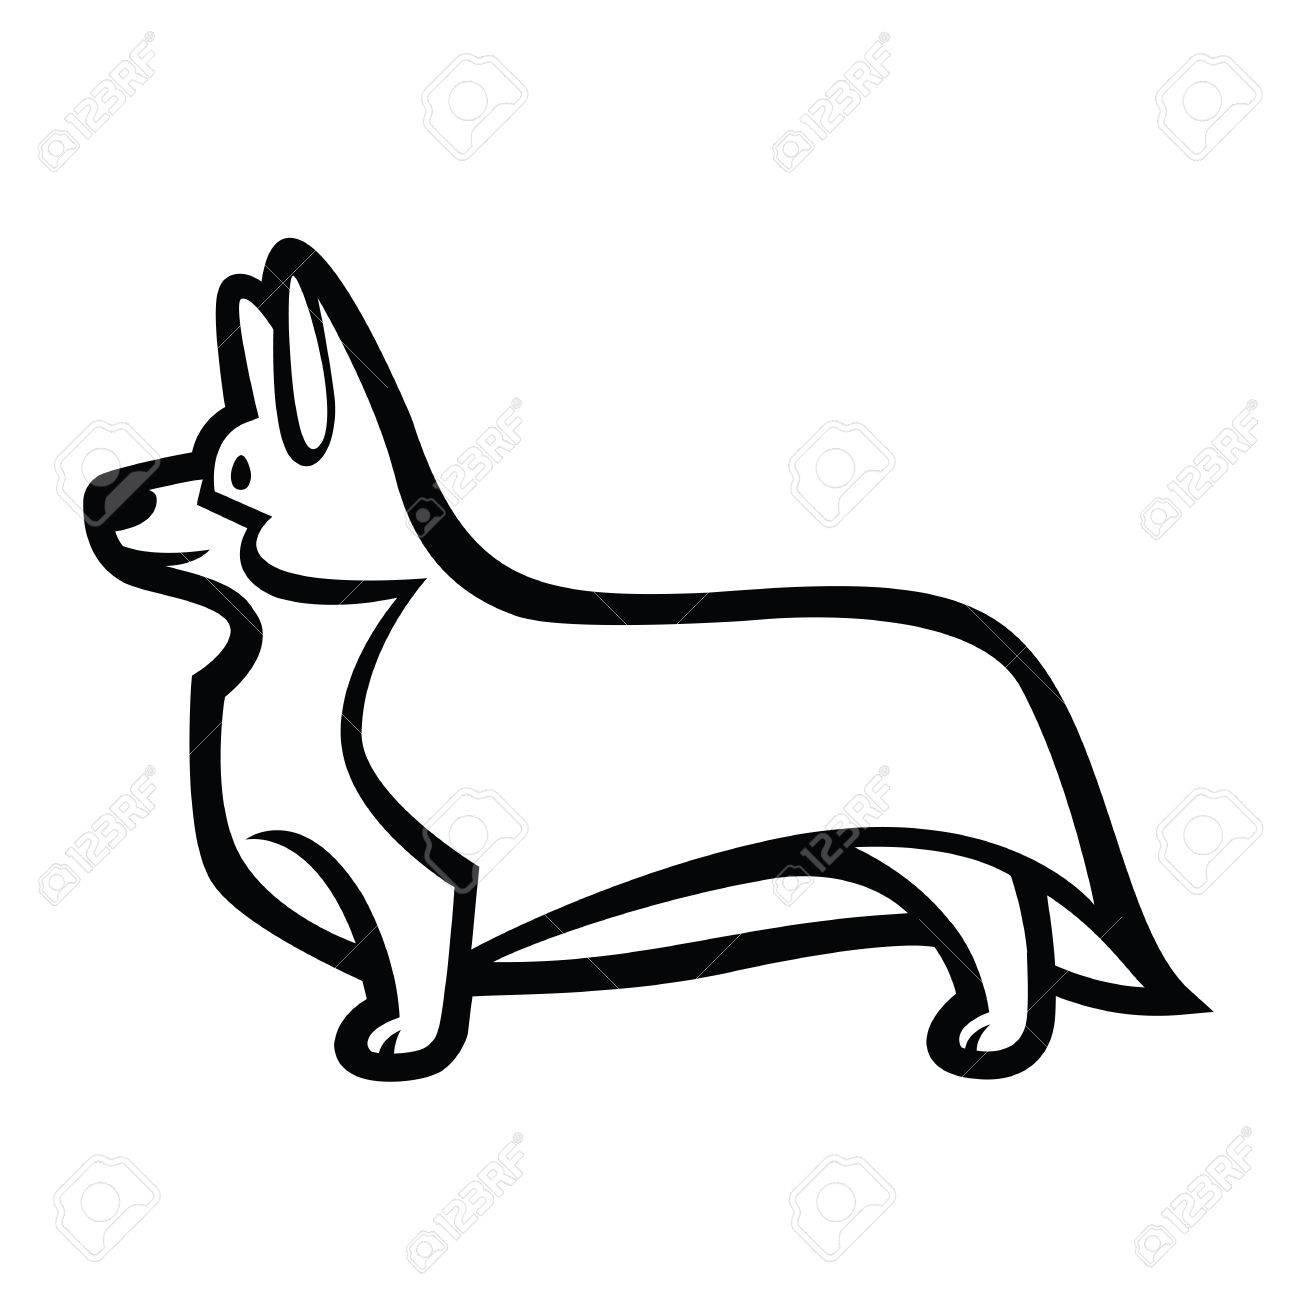 Dibujo Lineal Perro